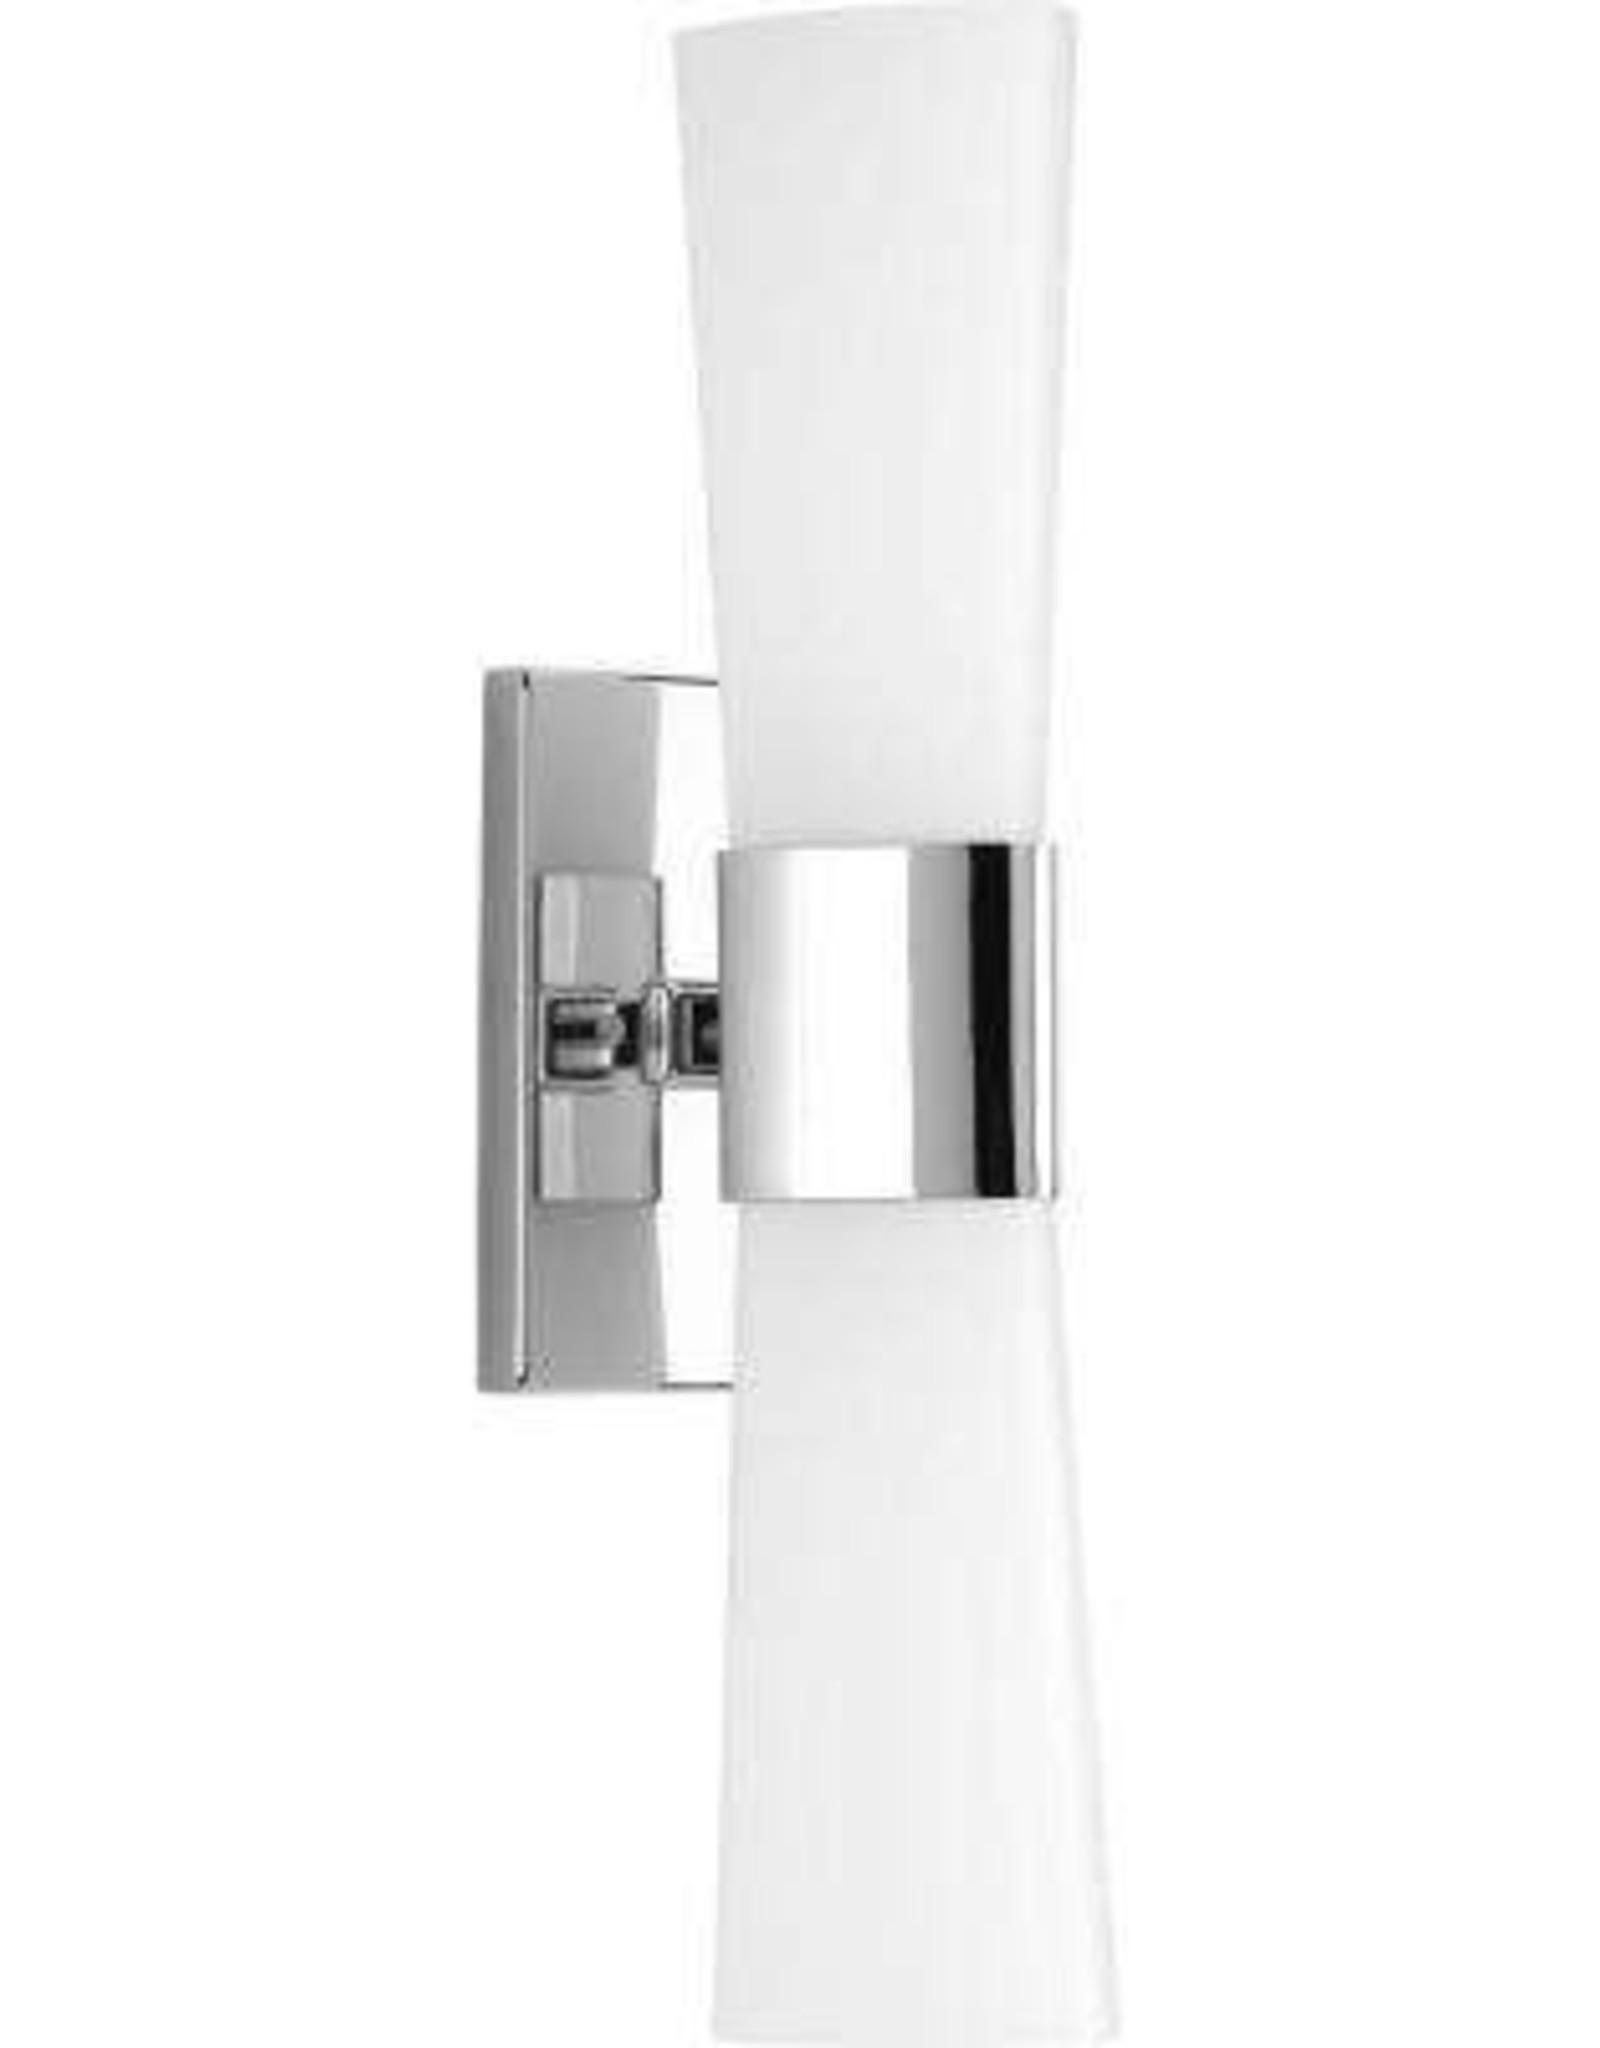 Progress Lighting Zura Collection 2-Light Polished Chrome Bathroom Vanity Light